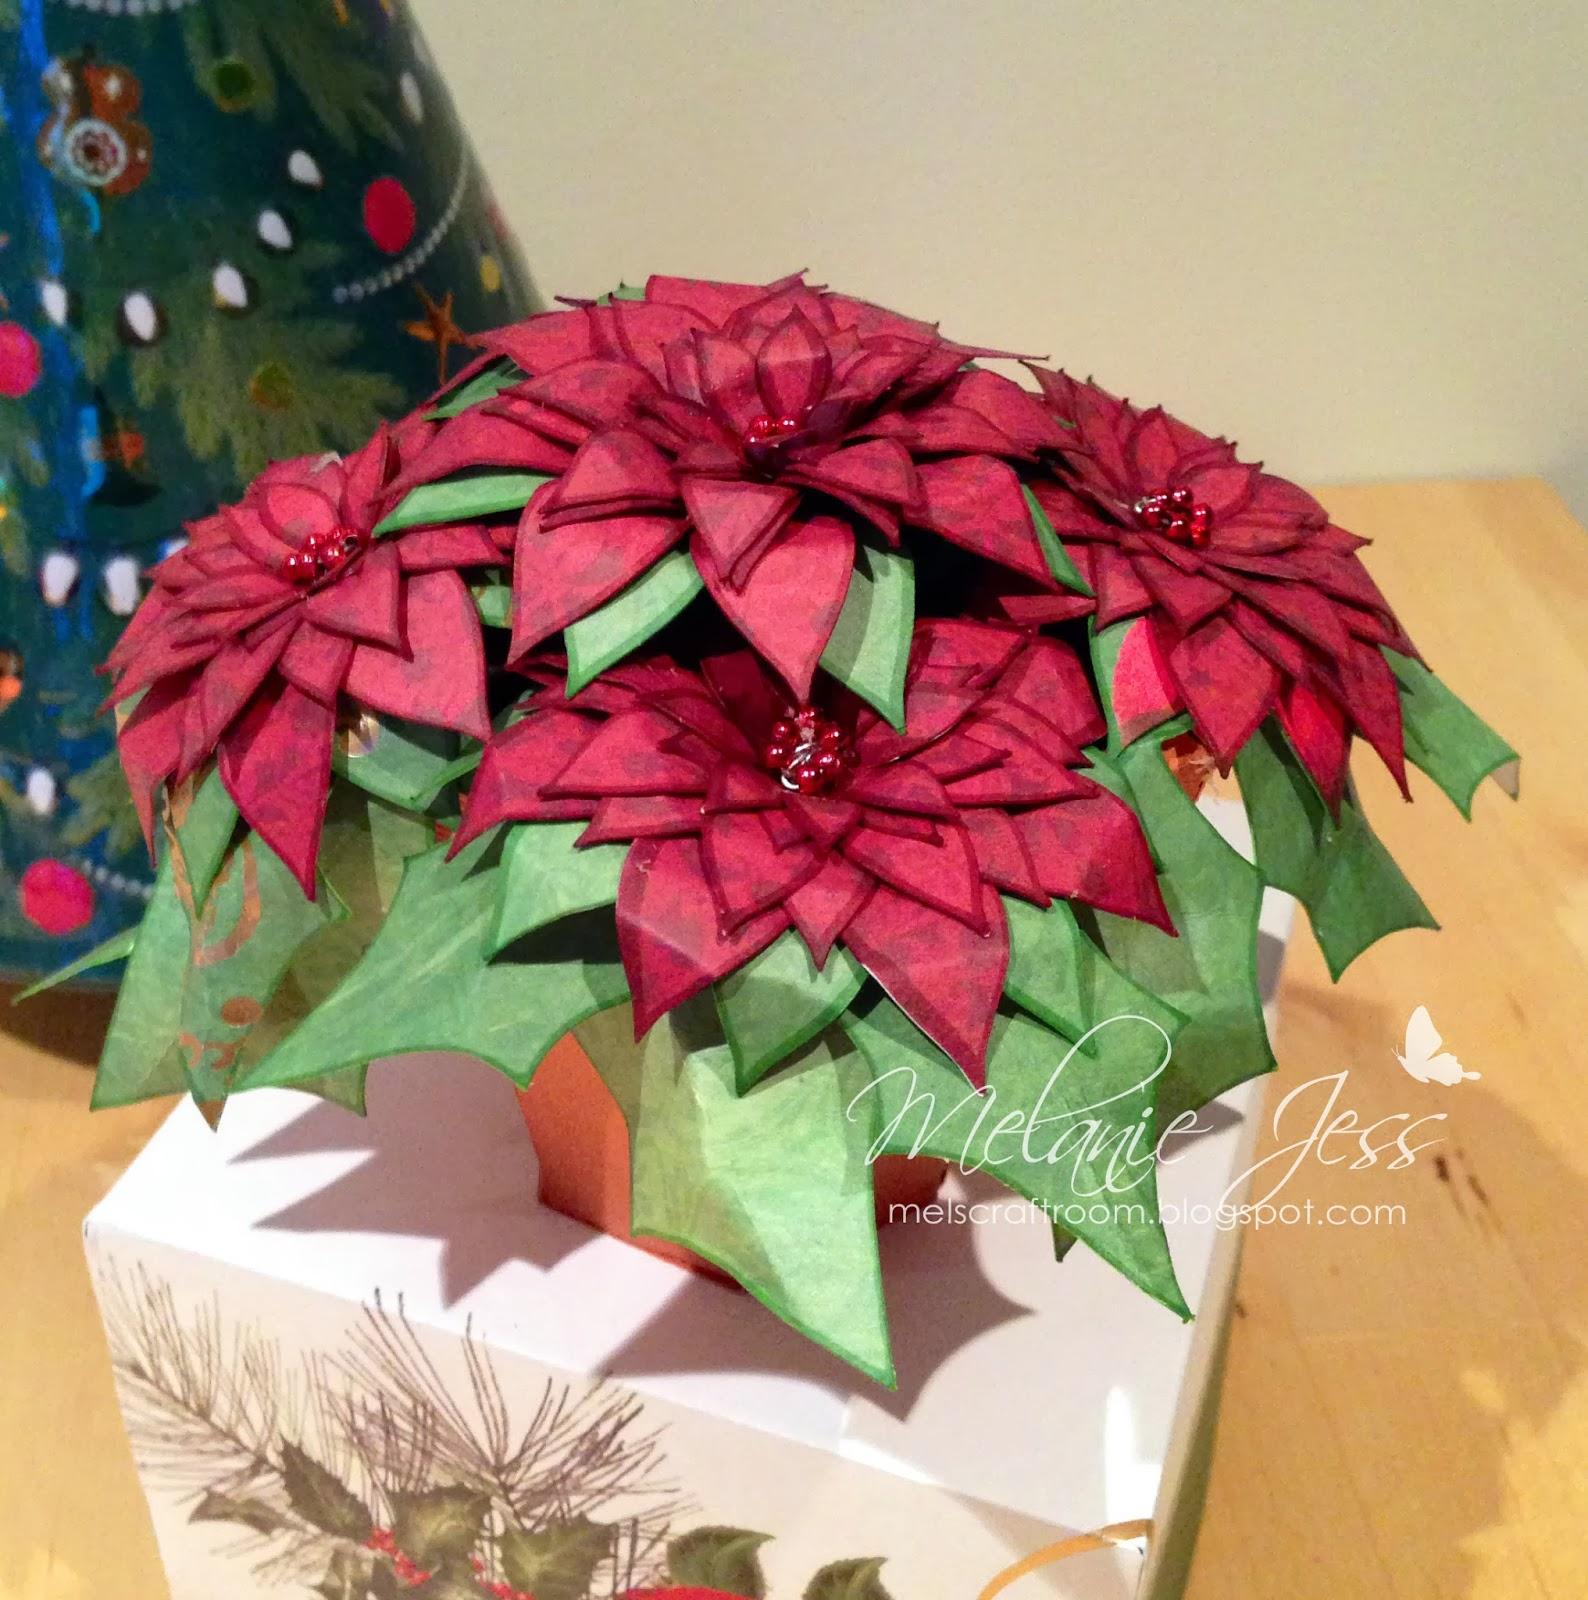 Mel Jess Designs Potted Poinsettia Xx